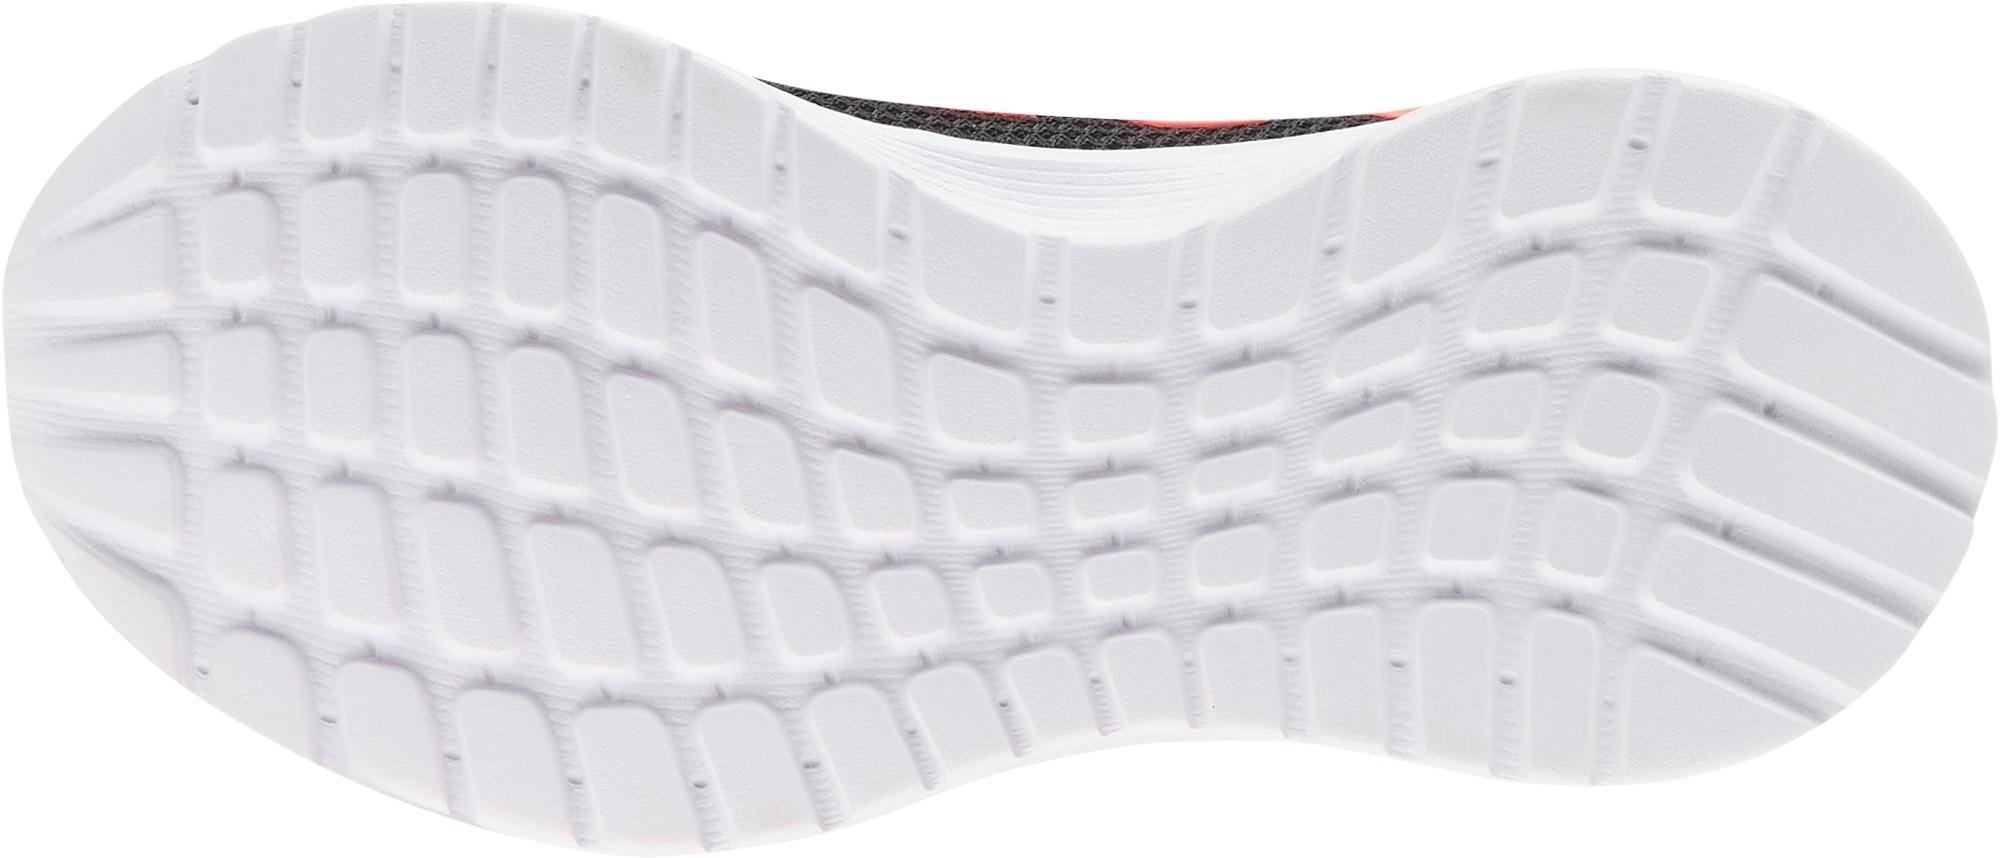 adidas Performance sneakers TENSAUR RUN C - gratis ruilen op otto.nl